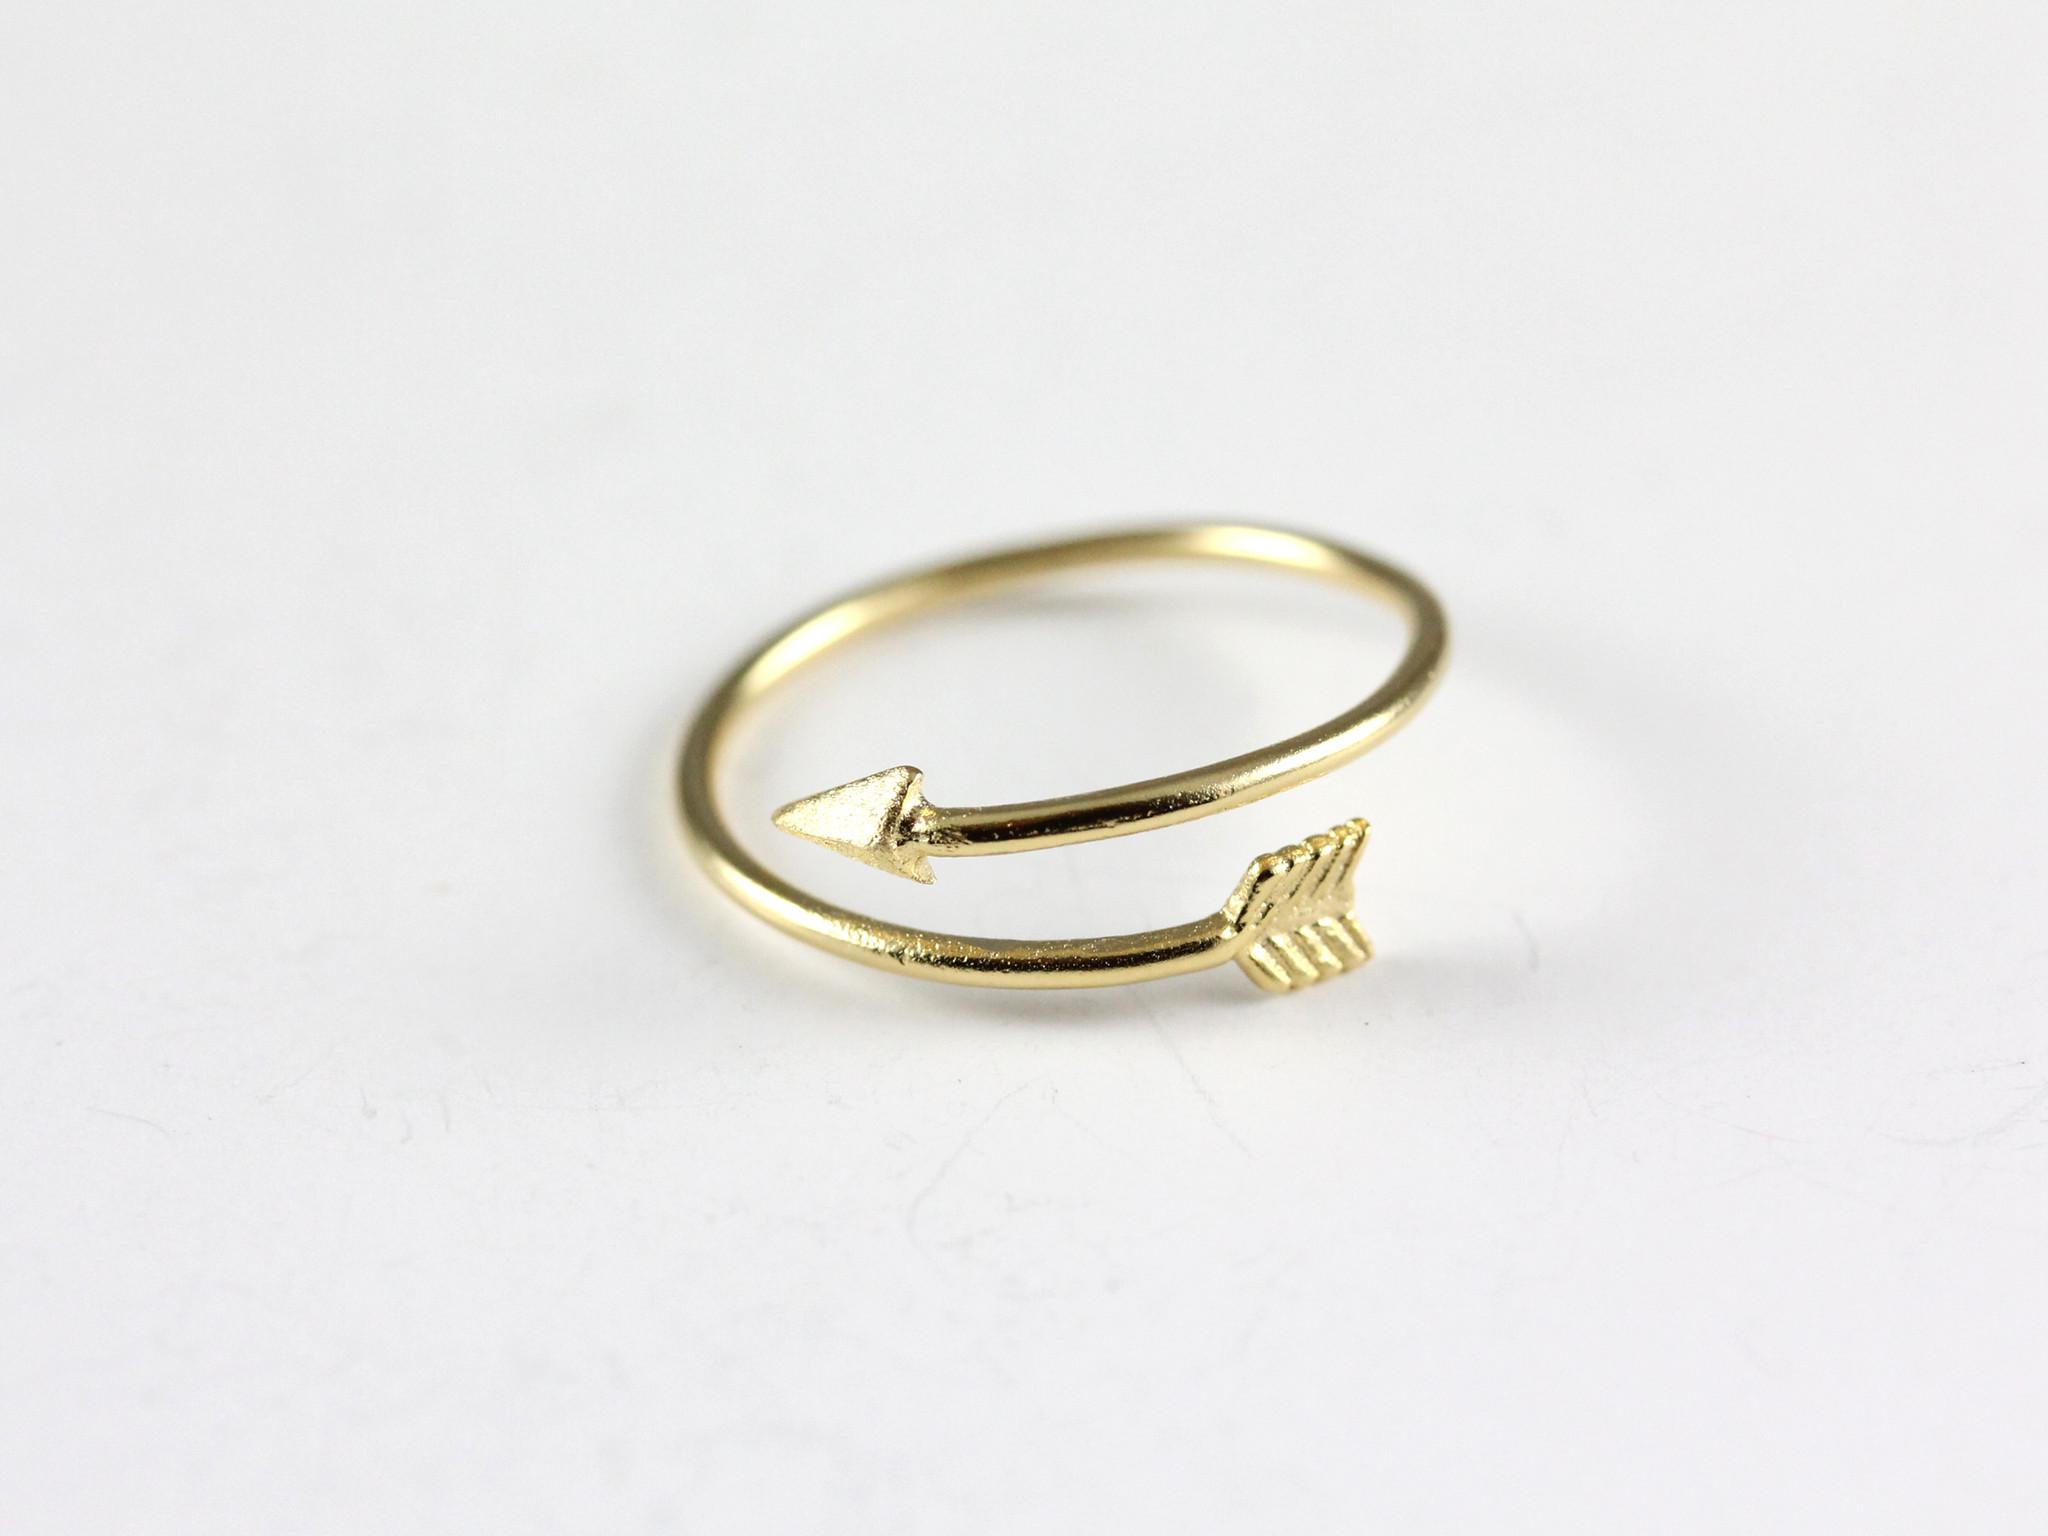 Arrow ring – hello miss apple